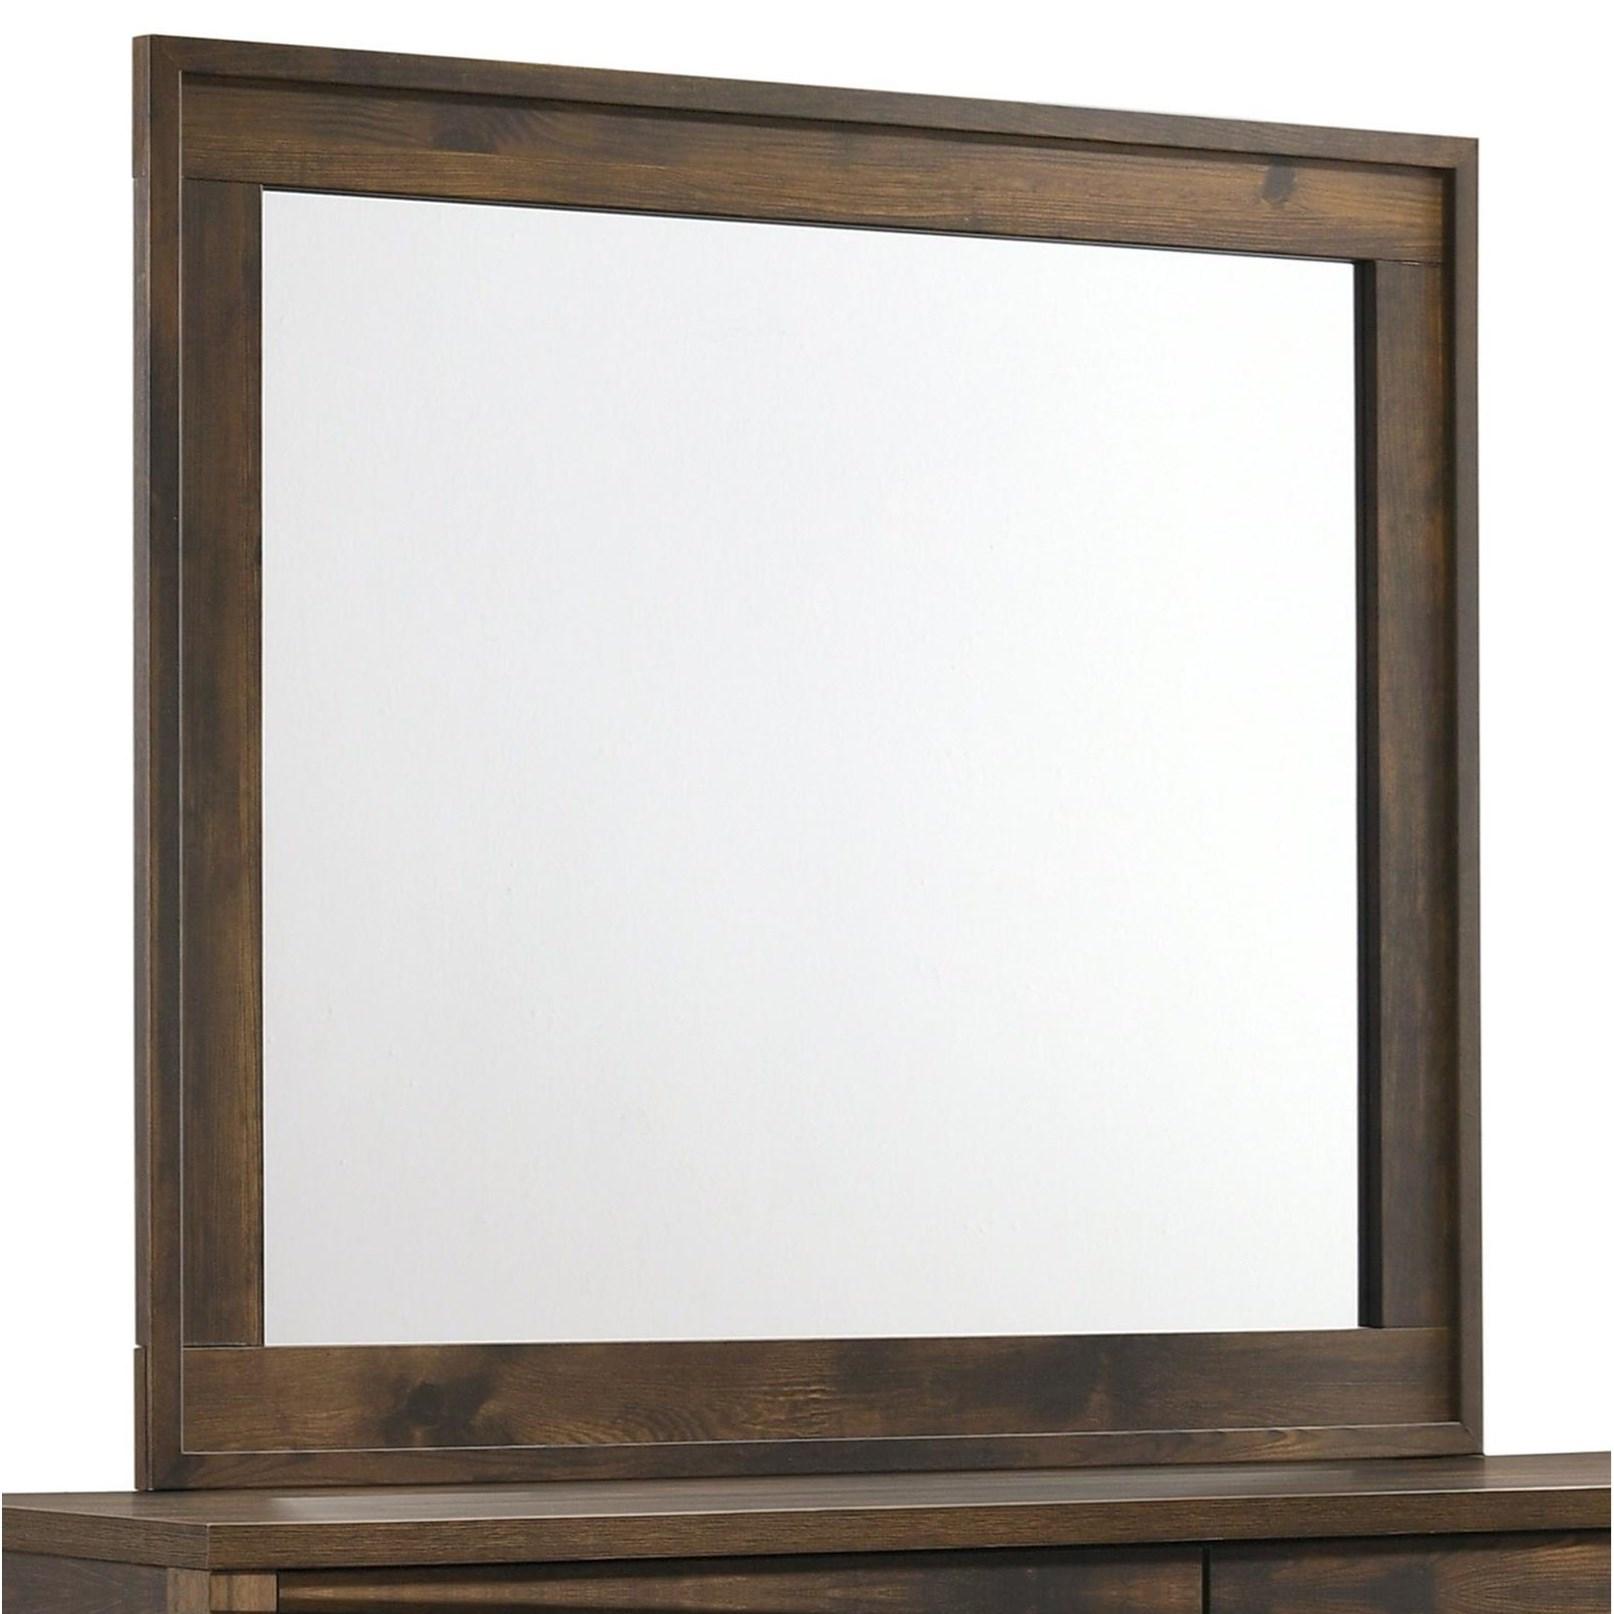 C8100A Mirror by Lifestyle at Furniture Fair - North Carolina